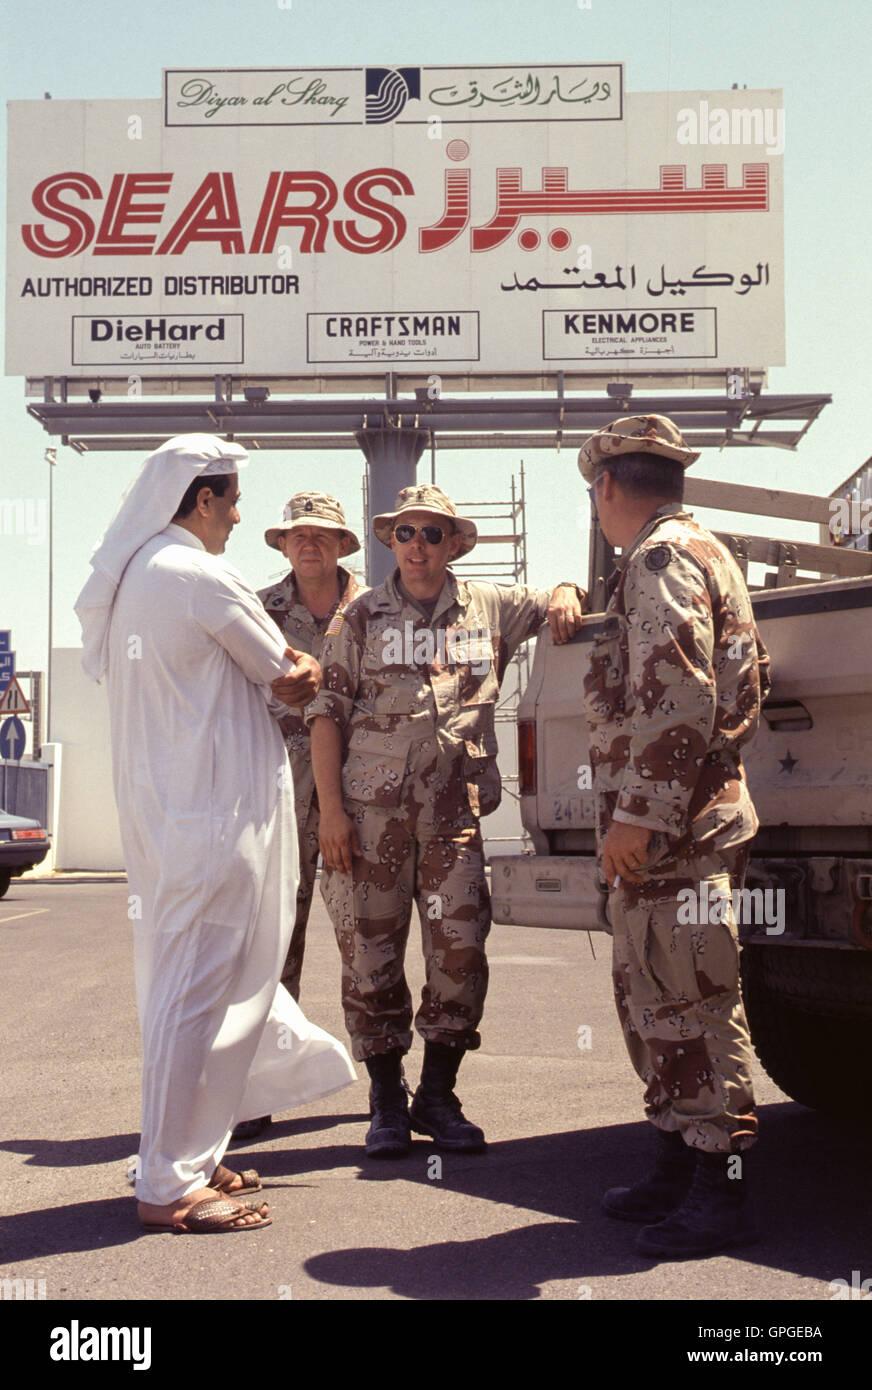 Oil Rich Gulf Arab Nation Stock Photos & Oil Rich Gulf Arab